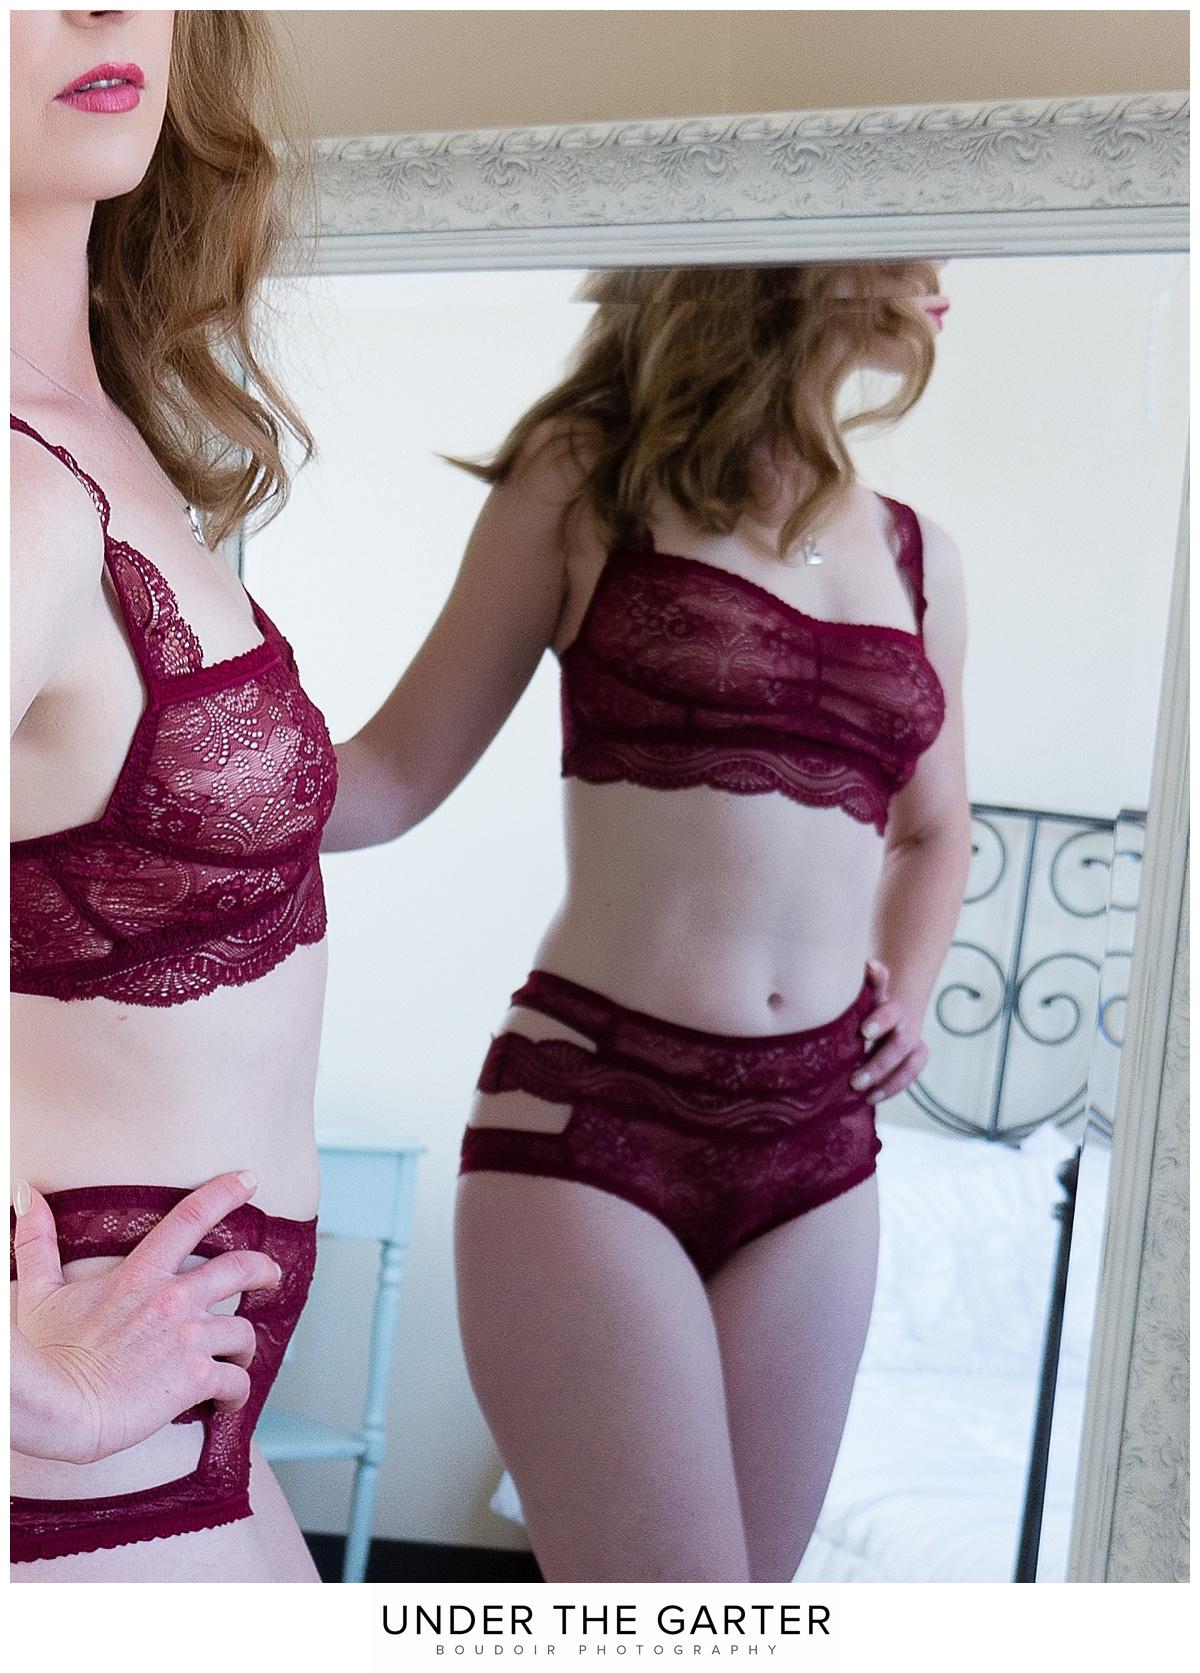 boudoir photography denver burgundy lace lingerie.jpg